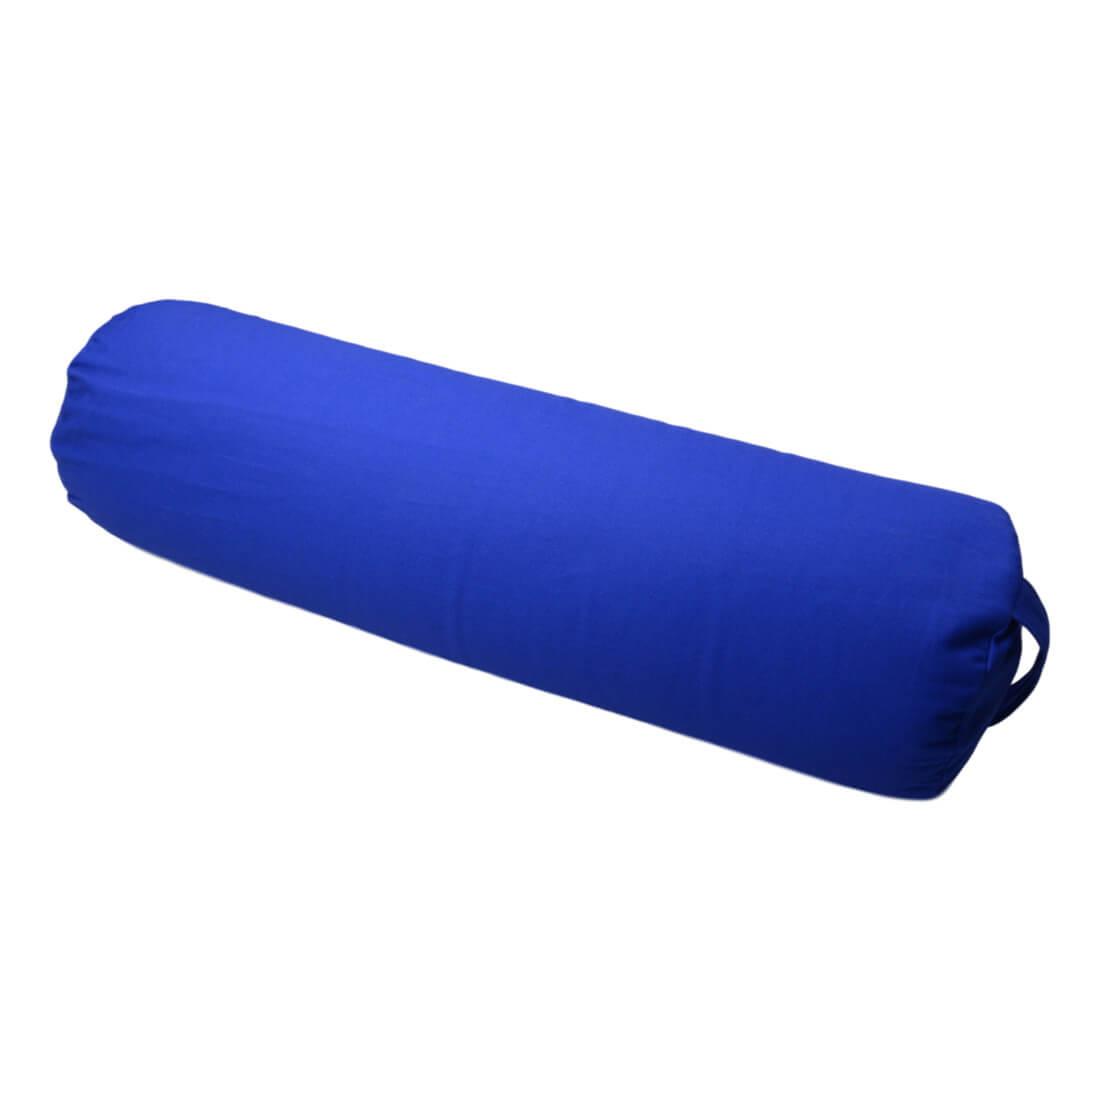 Bolster na jógu 70x20 cm modra